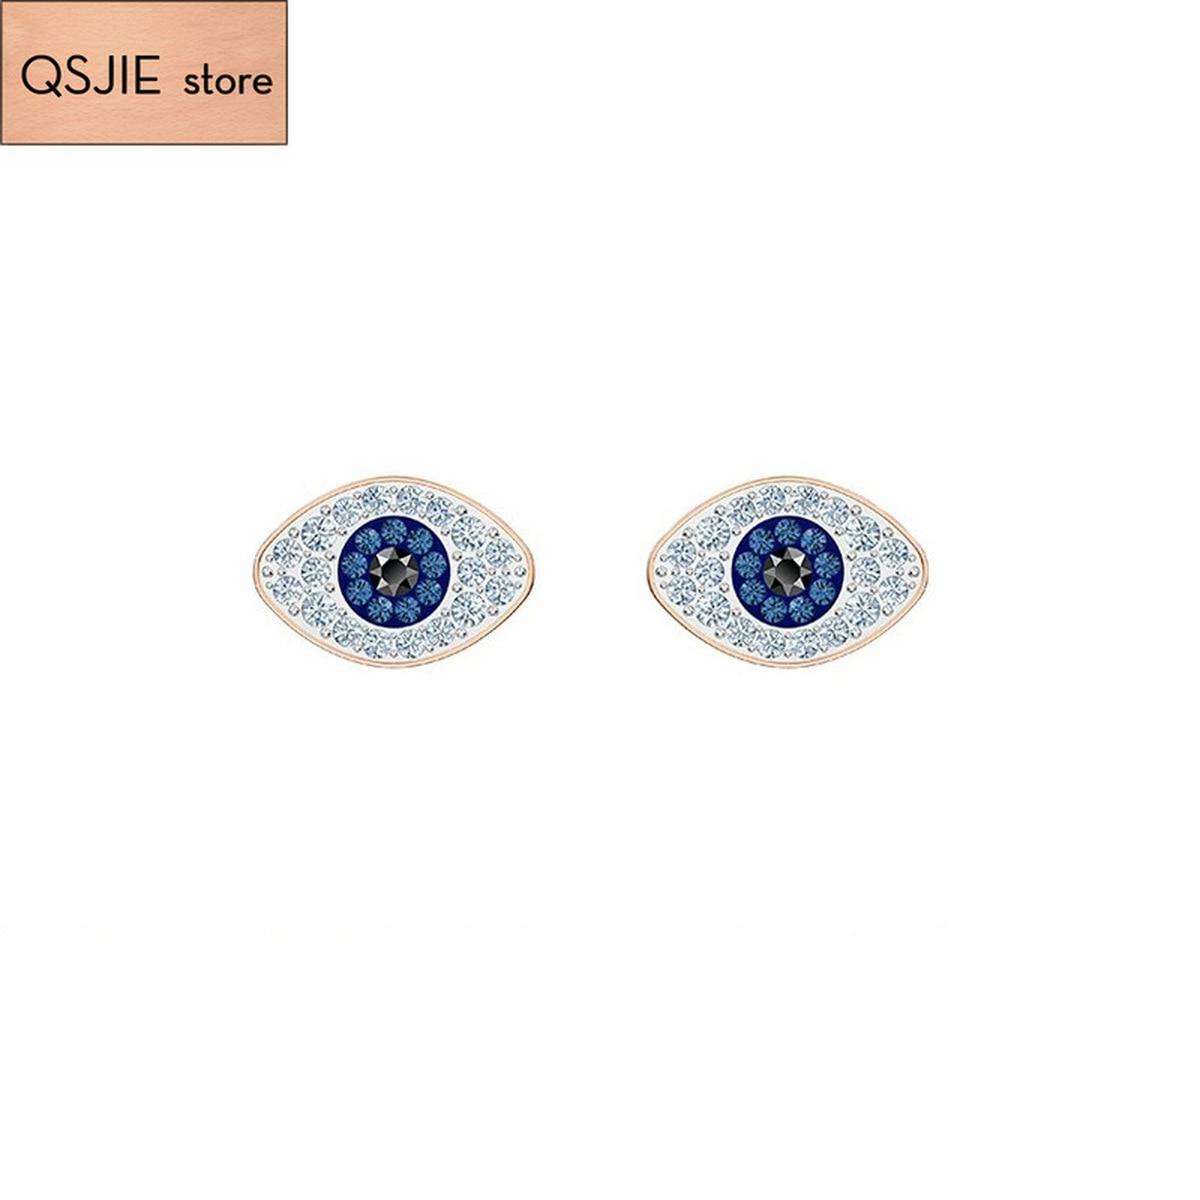 QSJIE High Quality Swa Blue Zircon Binocular Original Earrings Glamorous fashion jewelry